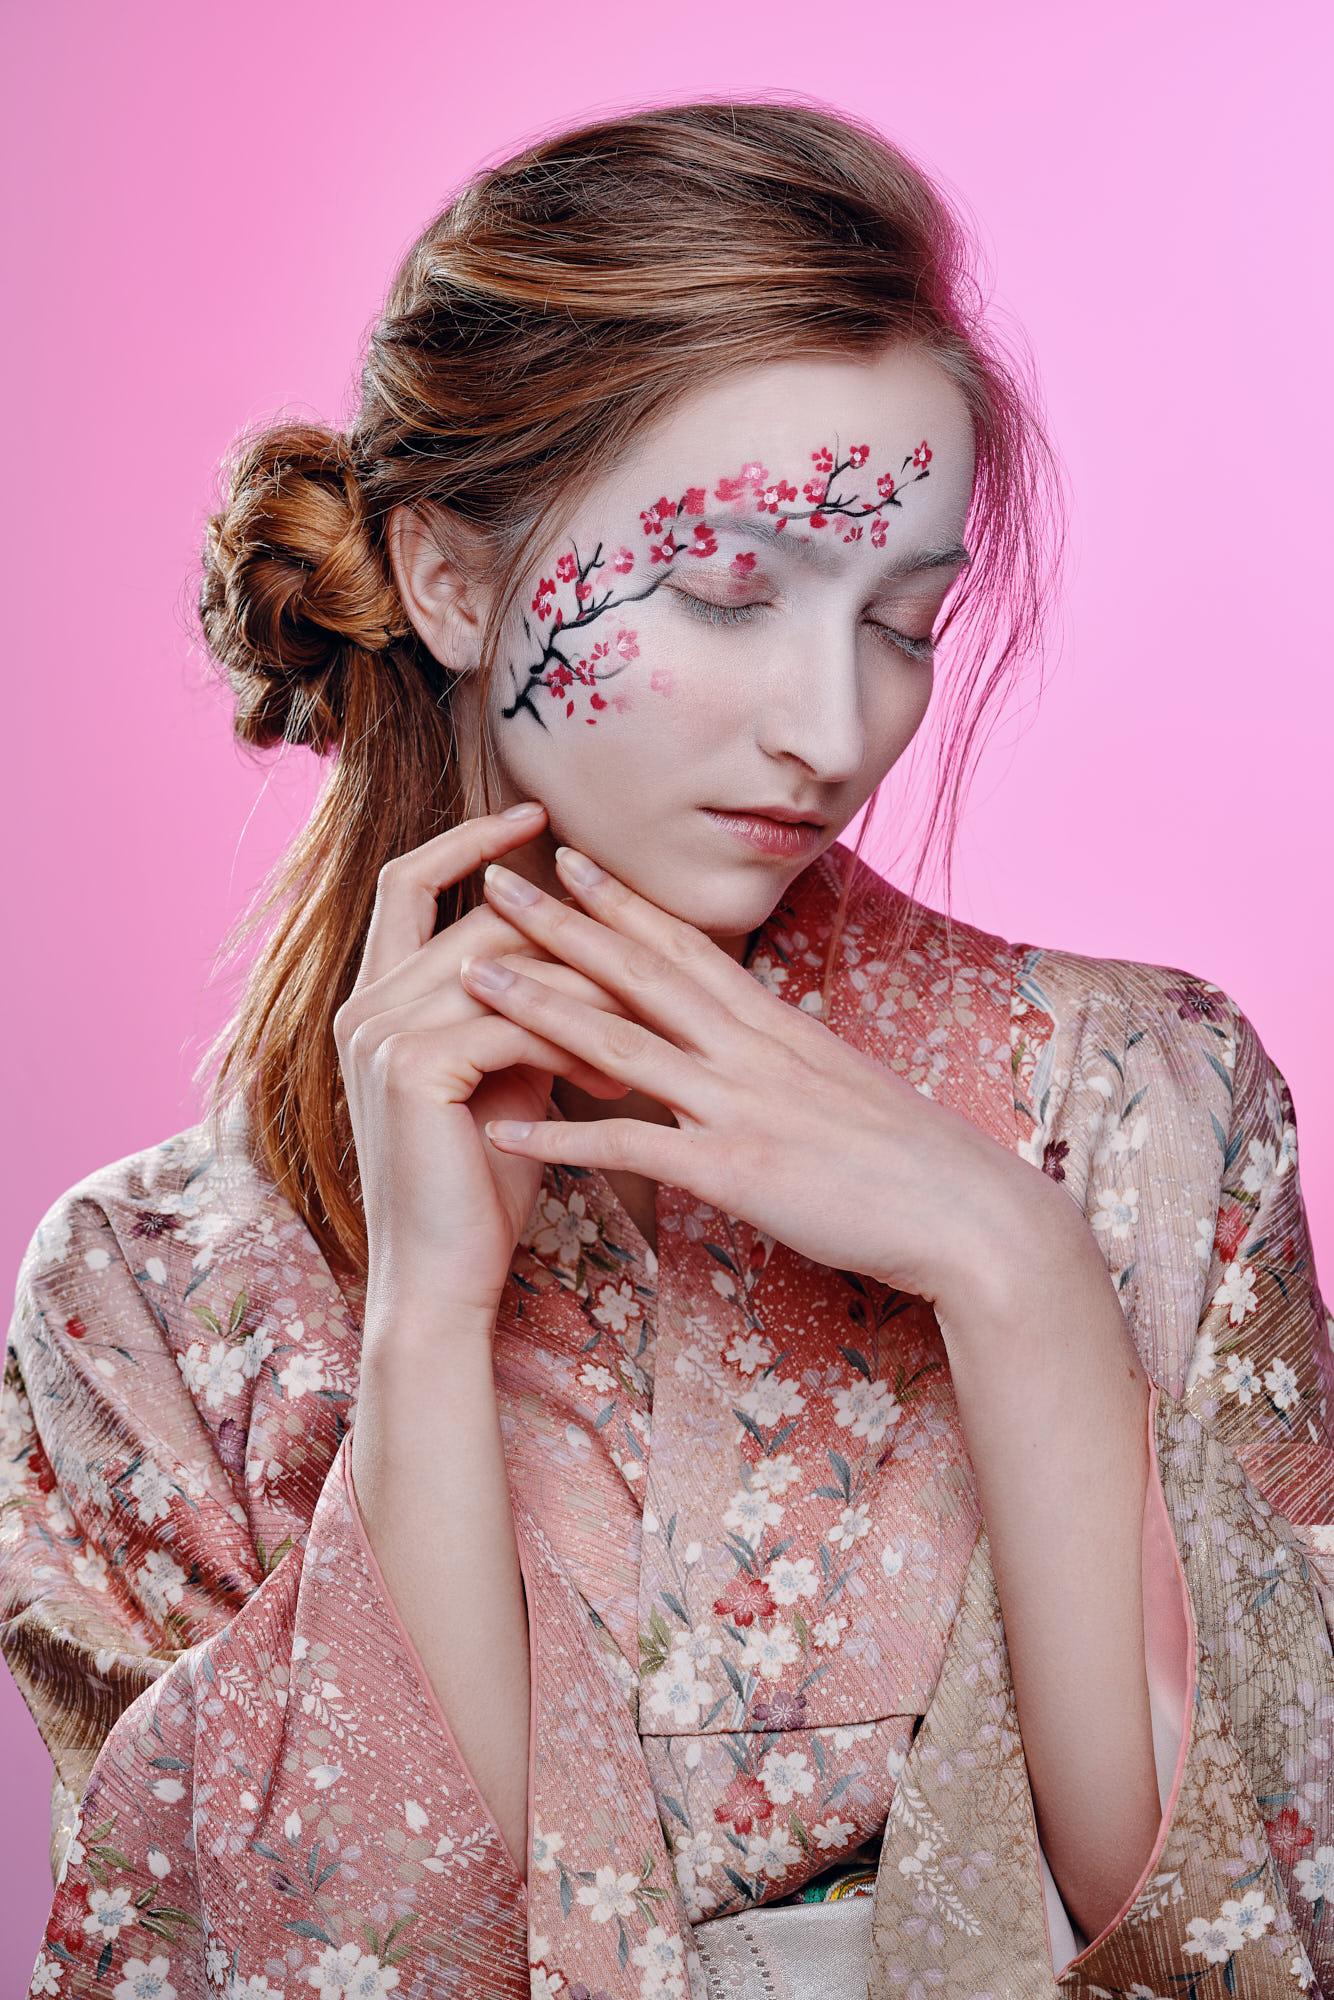 Lex & Josh Tiffanys Pro Makeup Spring Studio Shoot with Mika 5.jpg